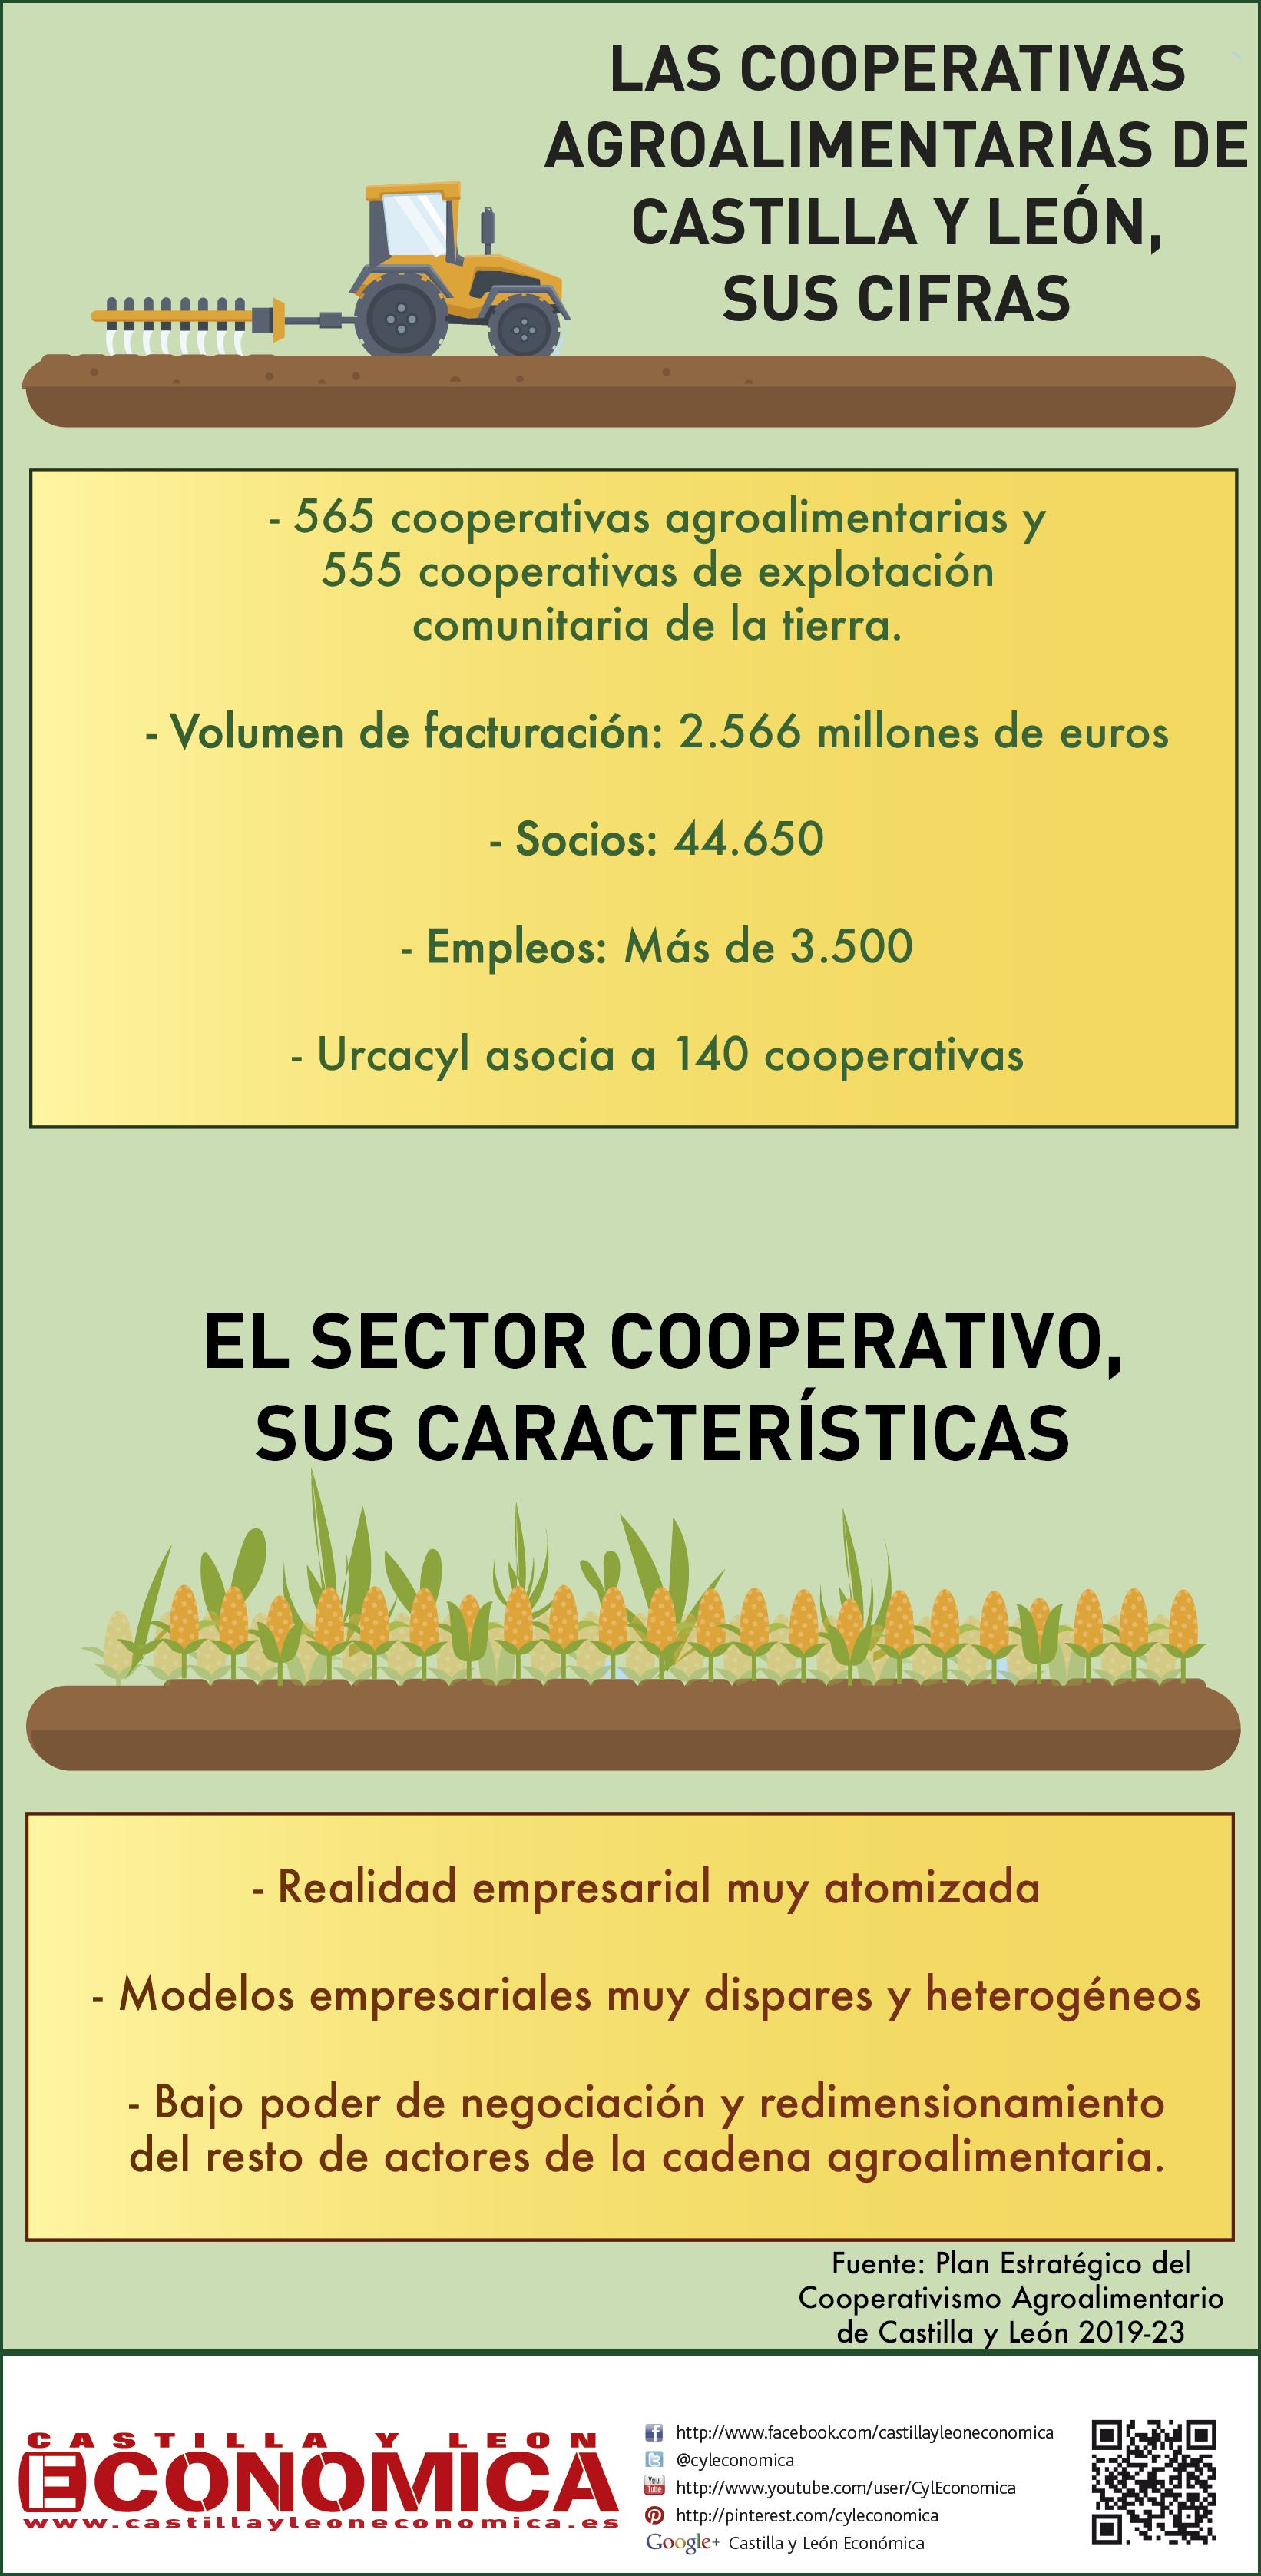 cooperativasagroalimentariasalta-01